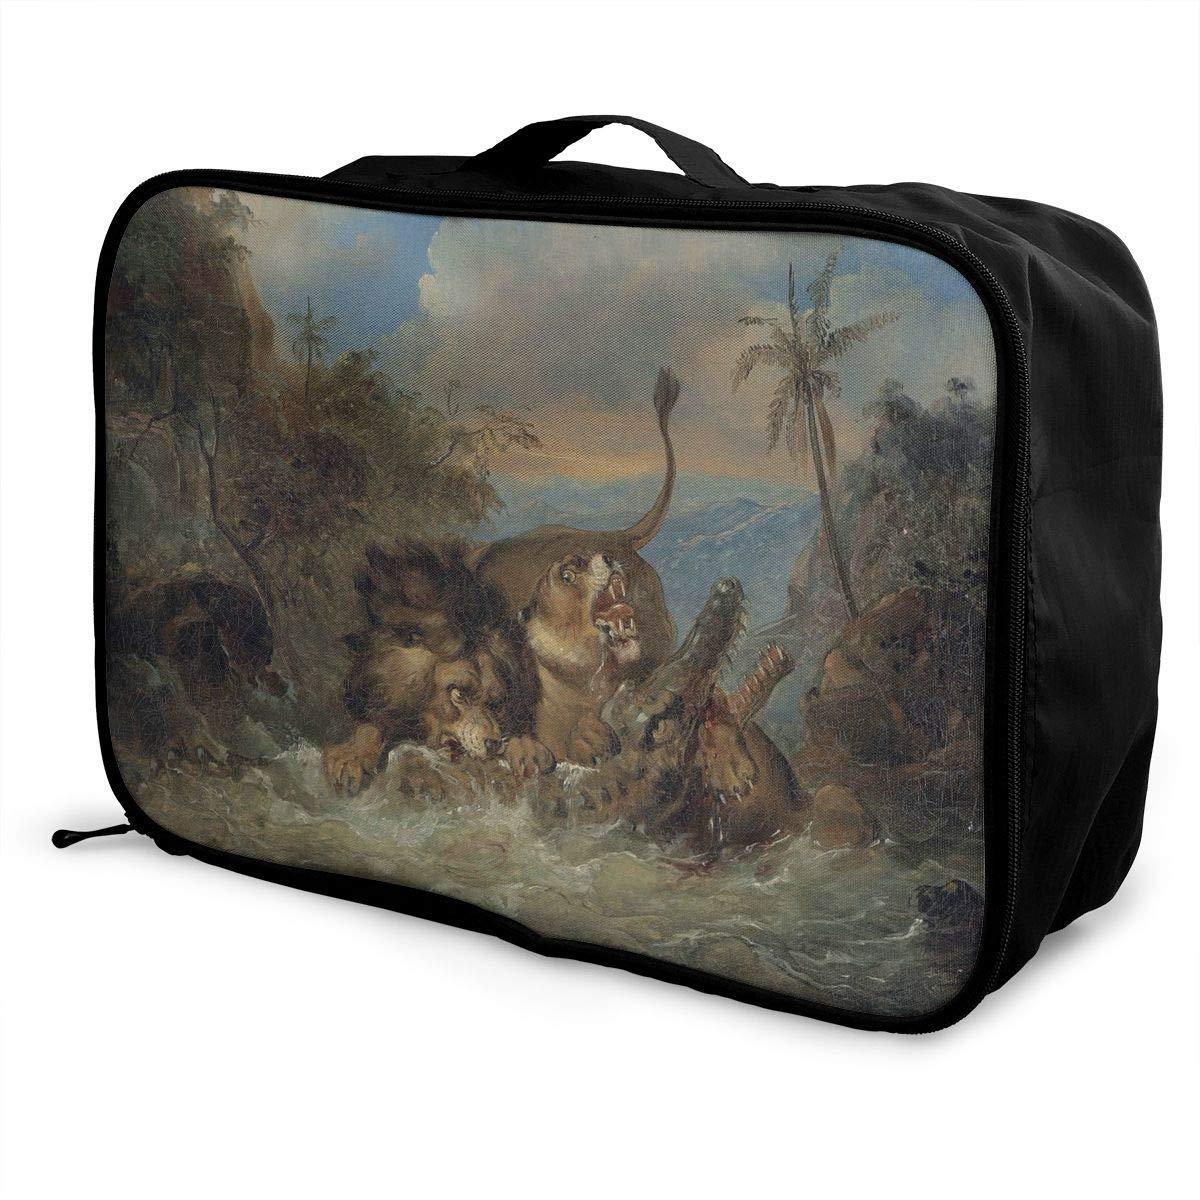 Lightweight Large Capacity Portable Duffel Bag for Men /& Women Mantis Dance Travel Duffel Bag Backpack JTRVW Luggage Bags for Travel